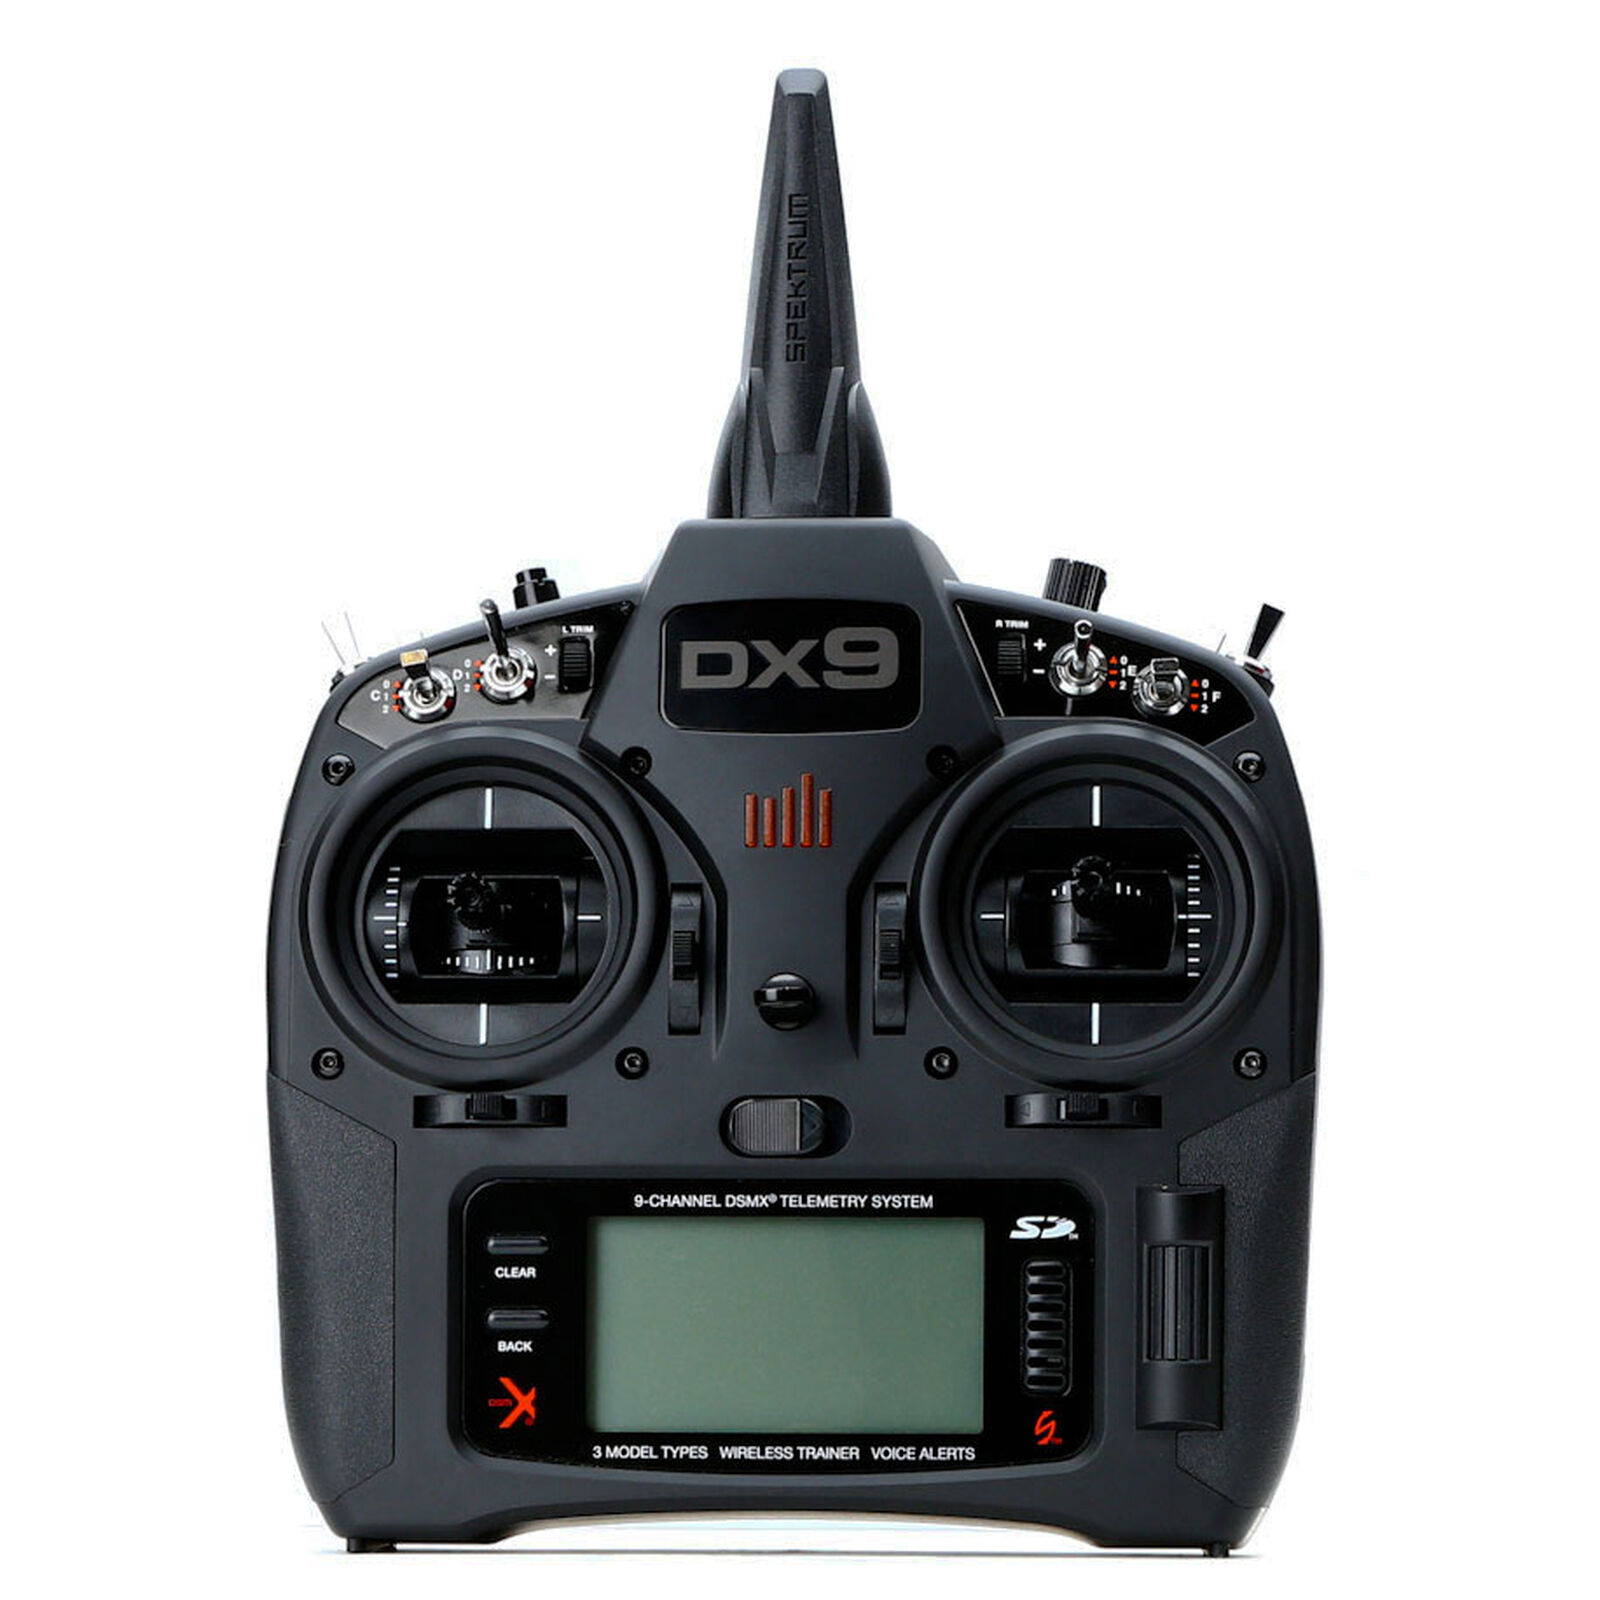 DX9 Black 9-Channel DSMX Transmitter Only